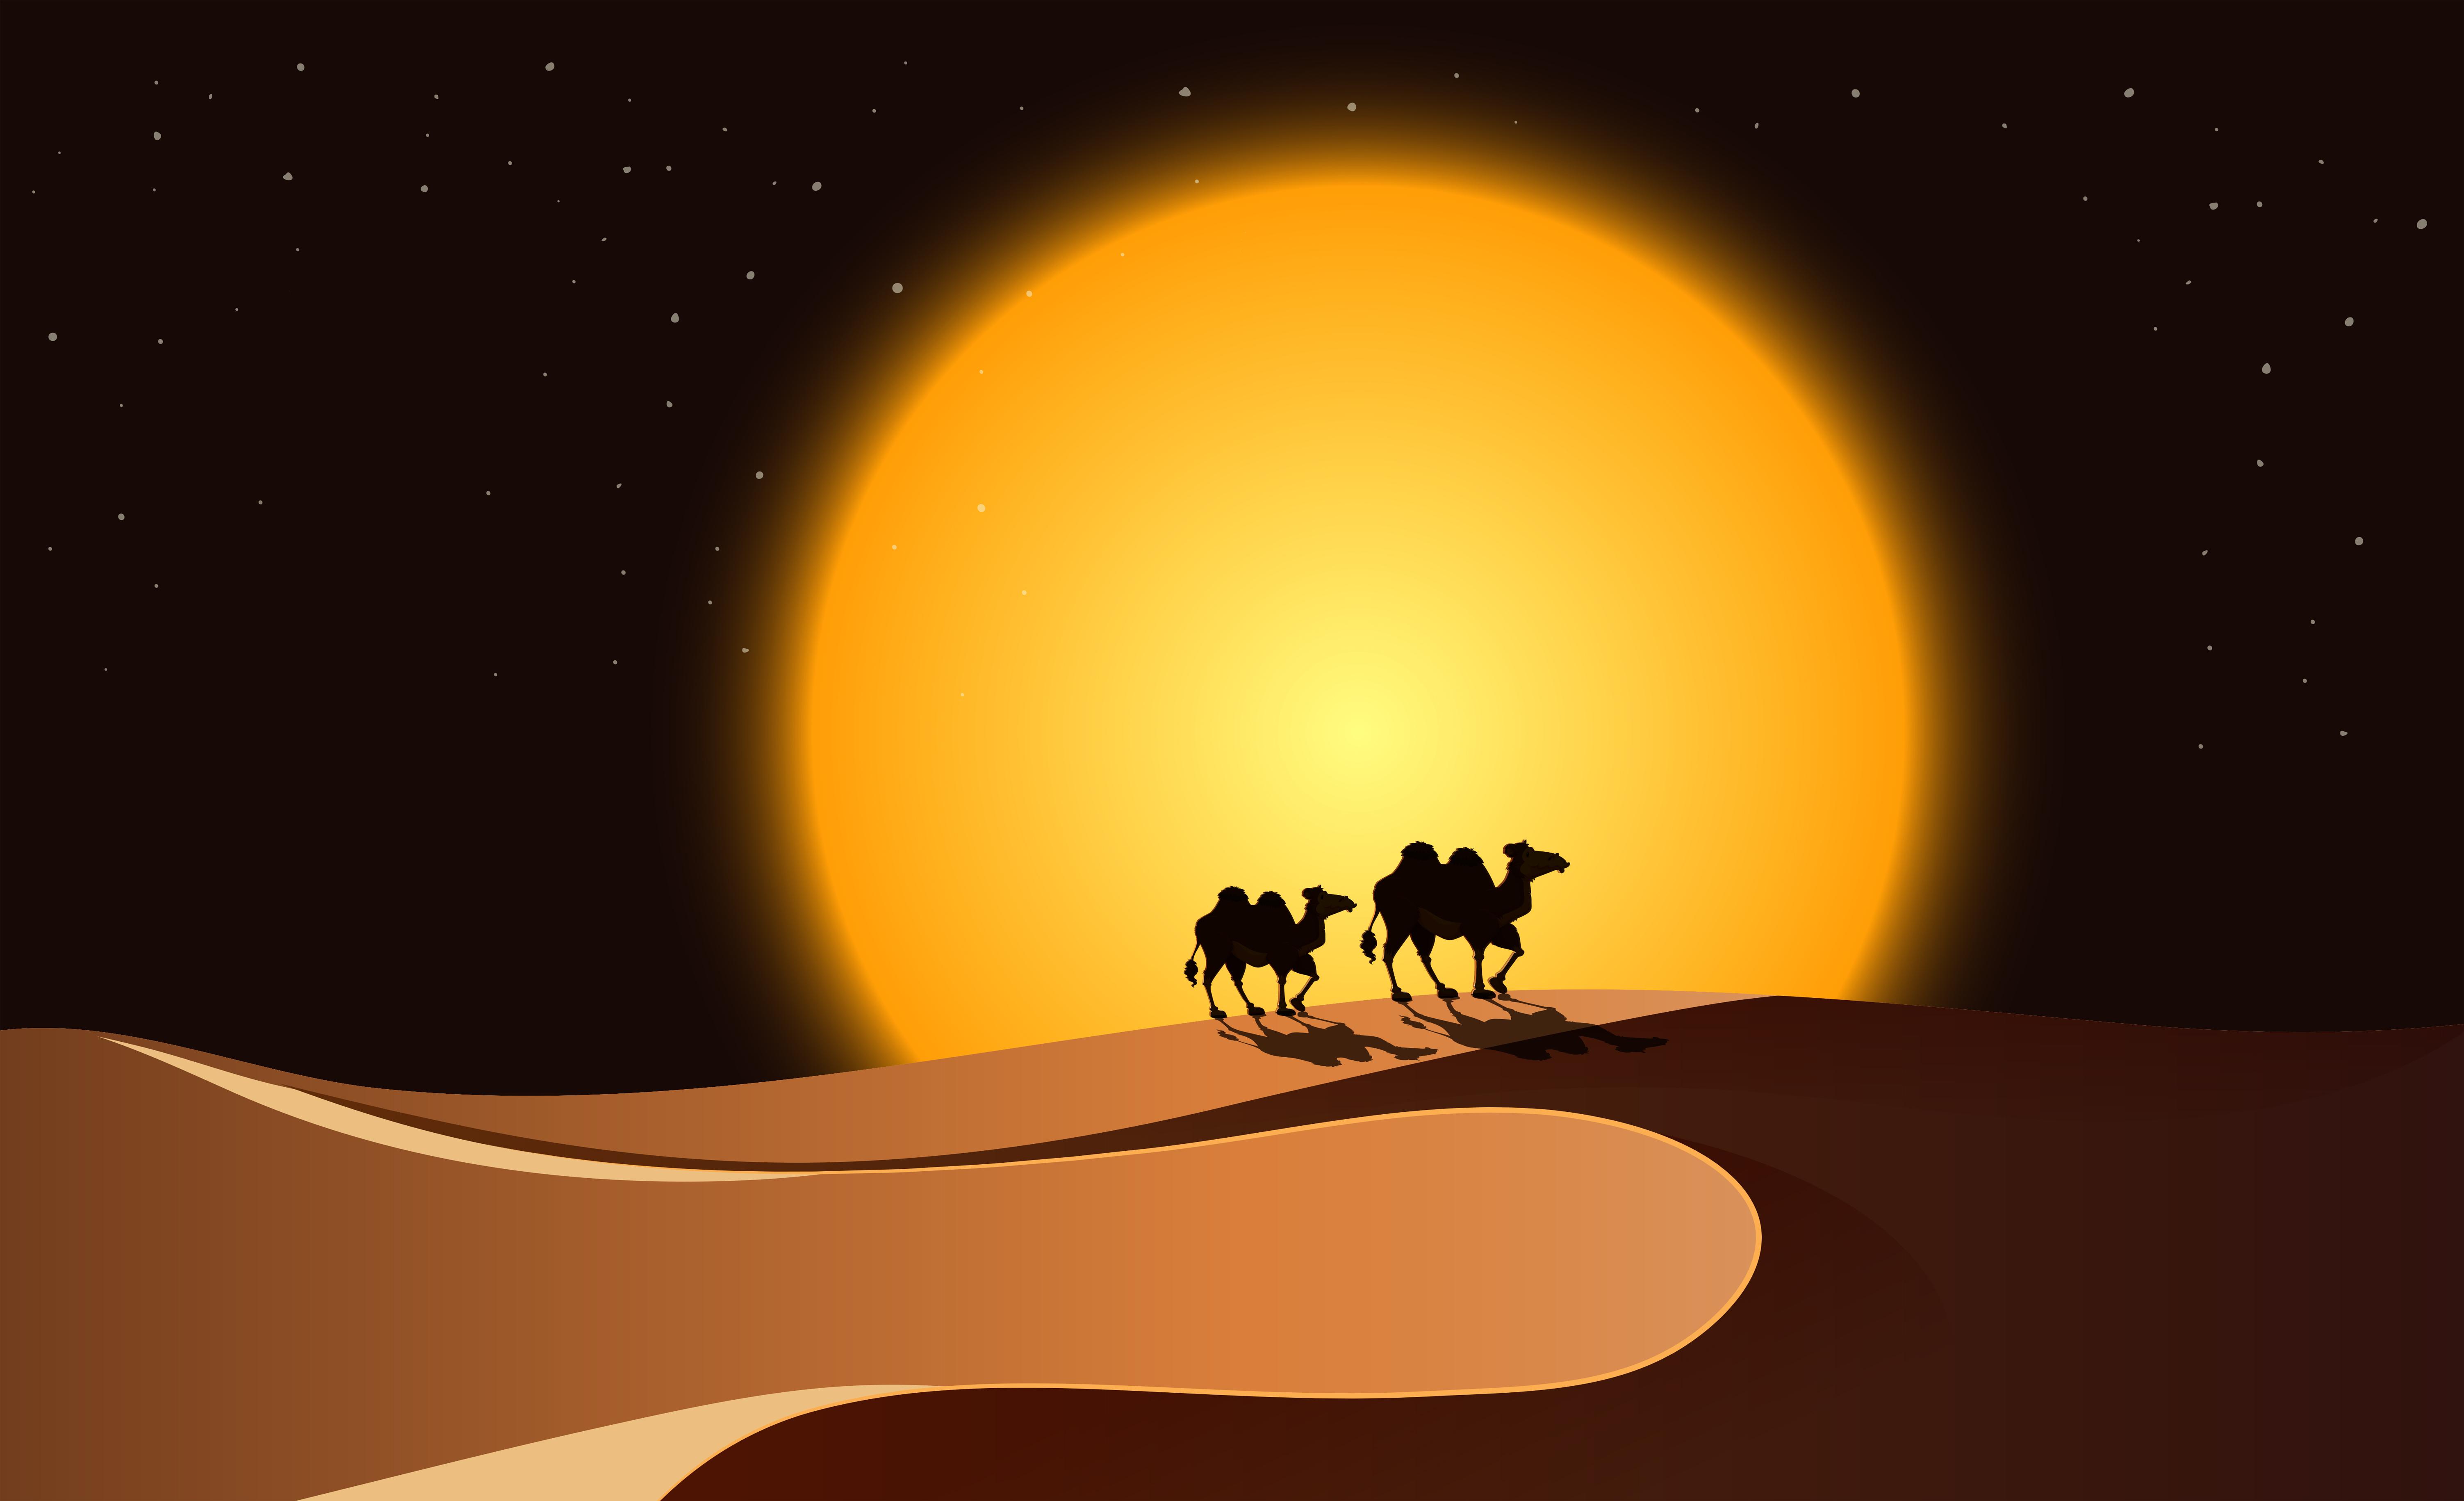 Desert Scene At Night Download Free Vector Art Stock